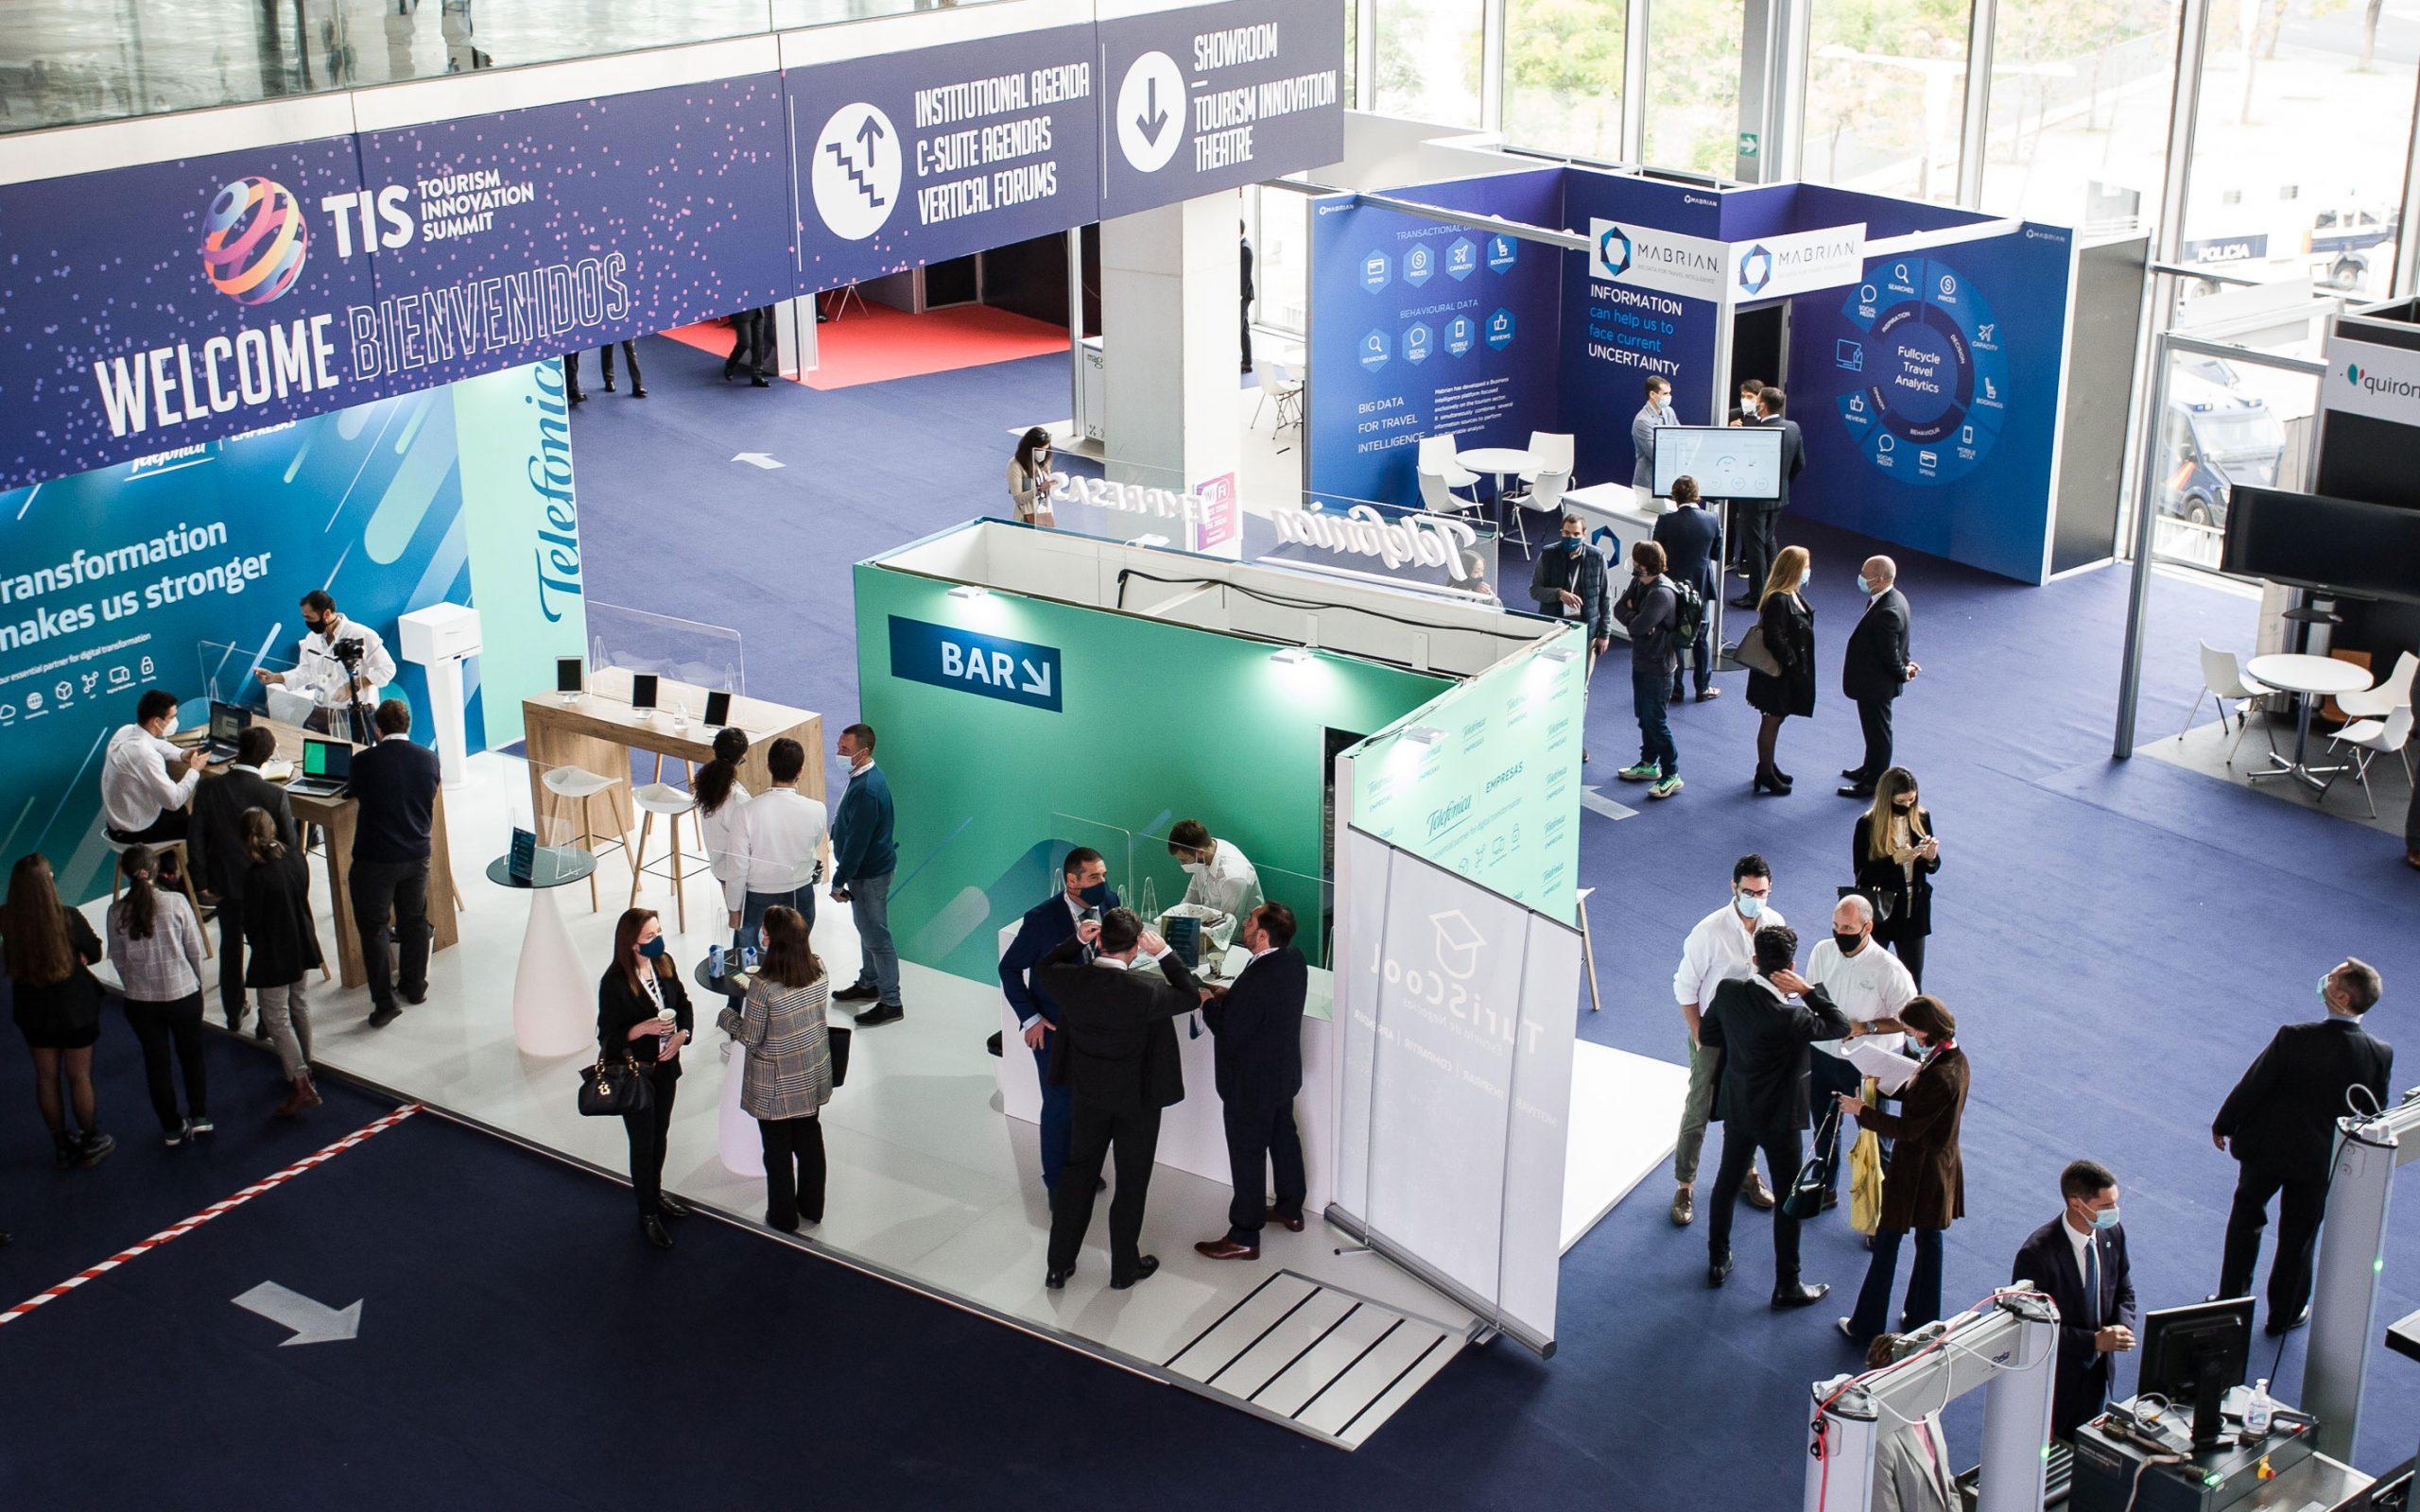 TIS - Tourism Innovation Summit 2021 returns to Seville to restart the new ways of travel